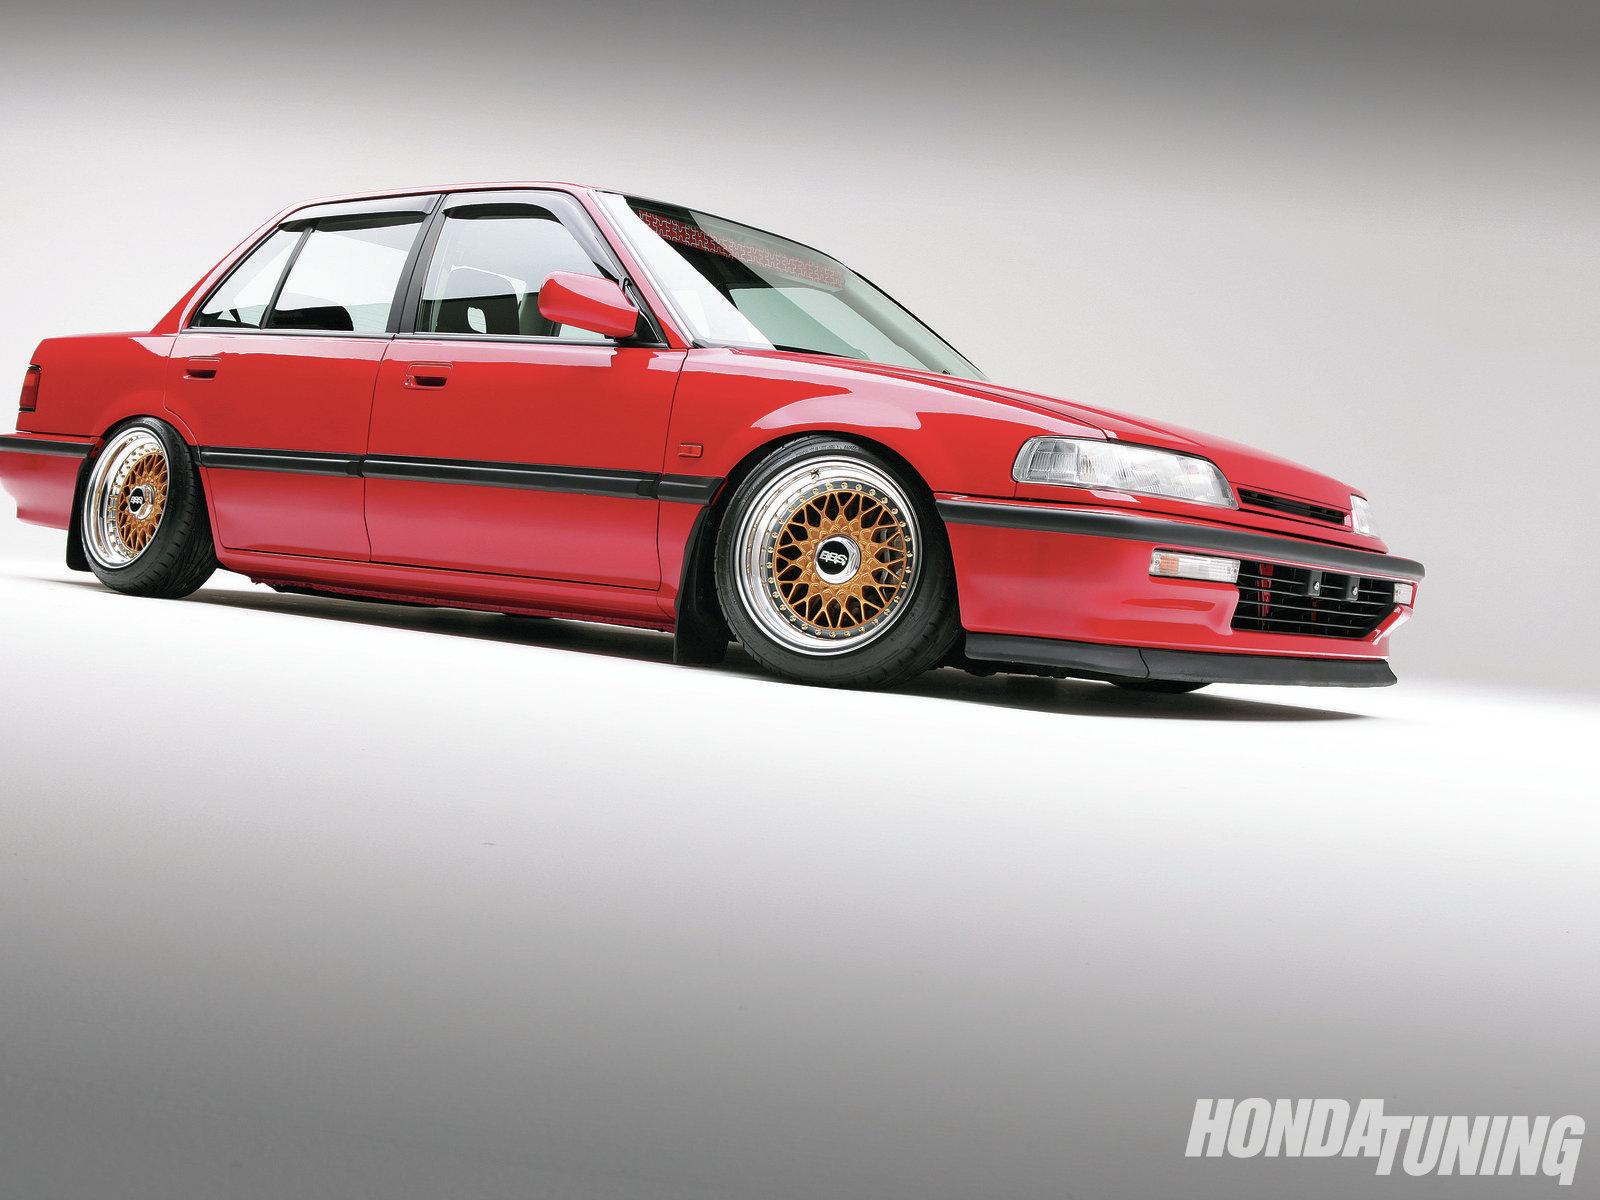 Kekurangan Honda Civic 91 Spesifikasi